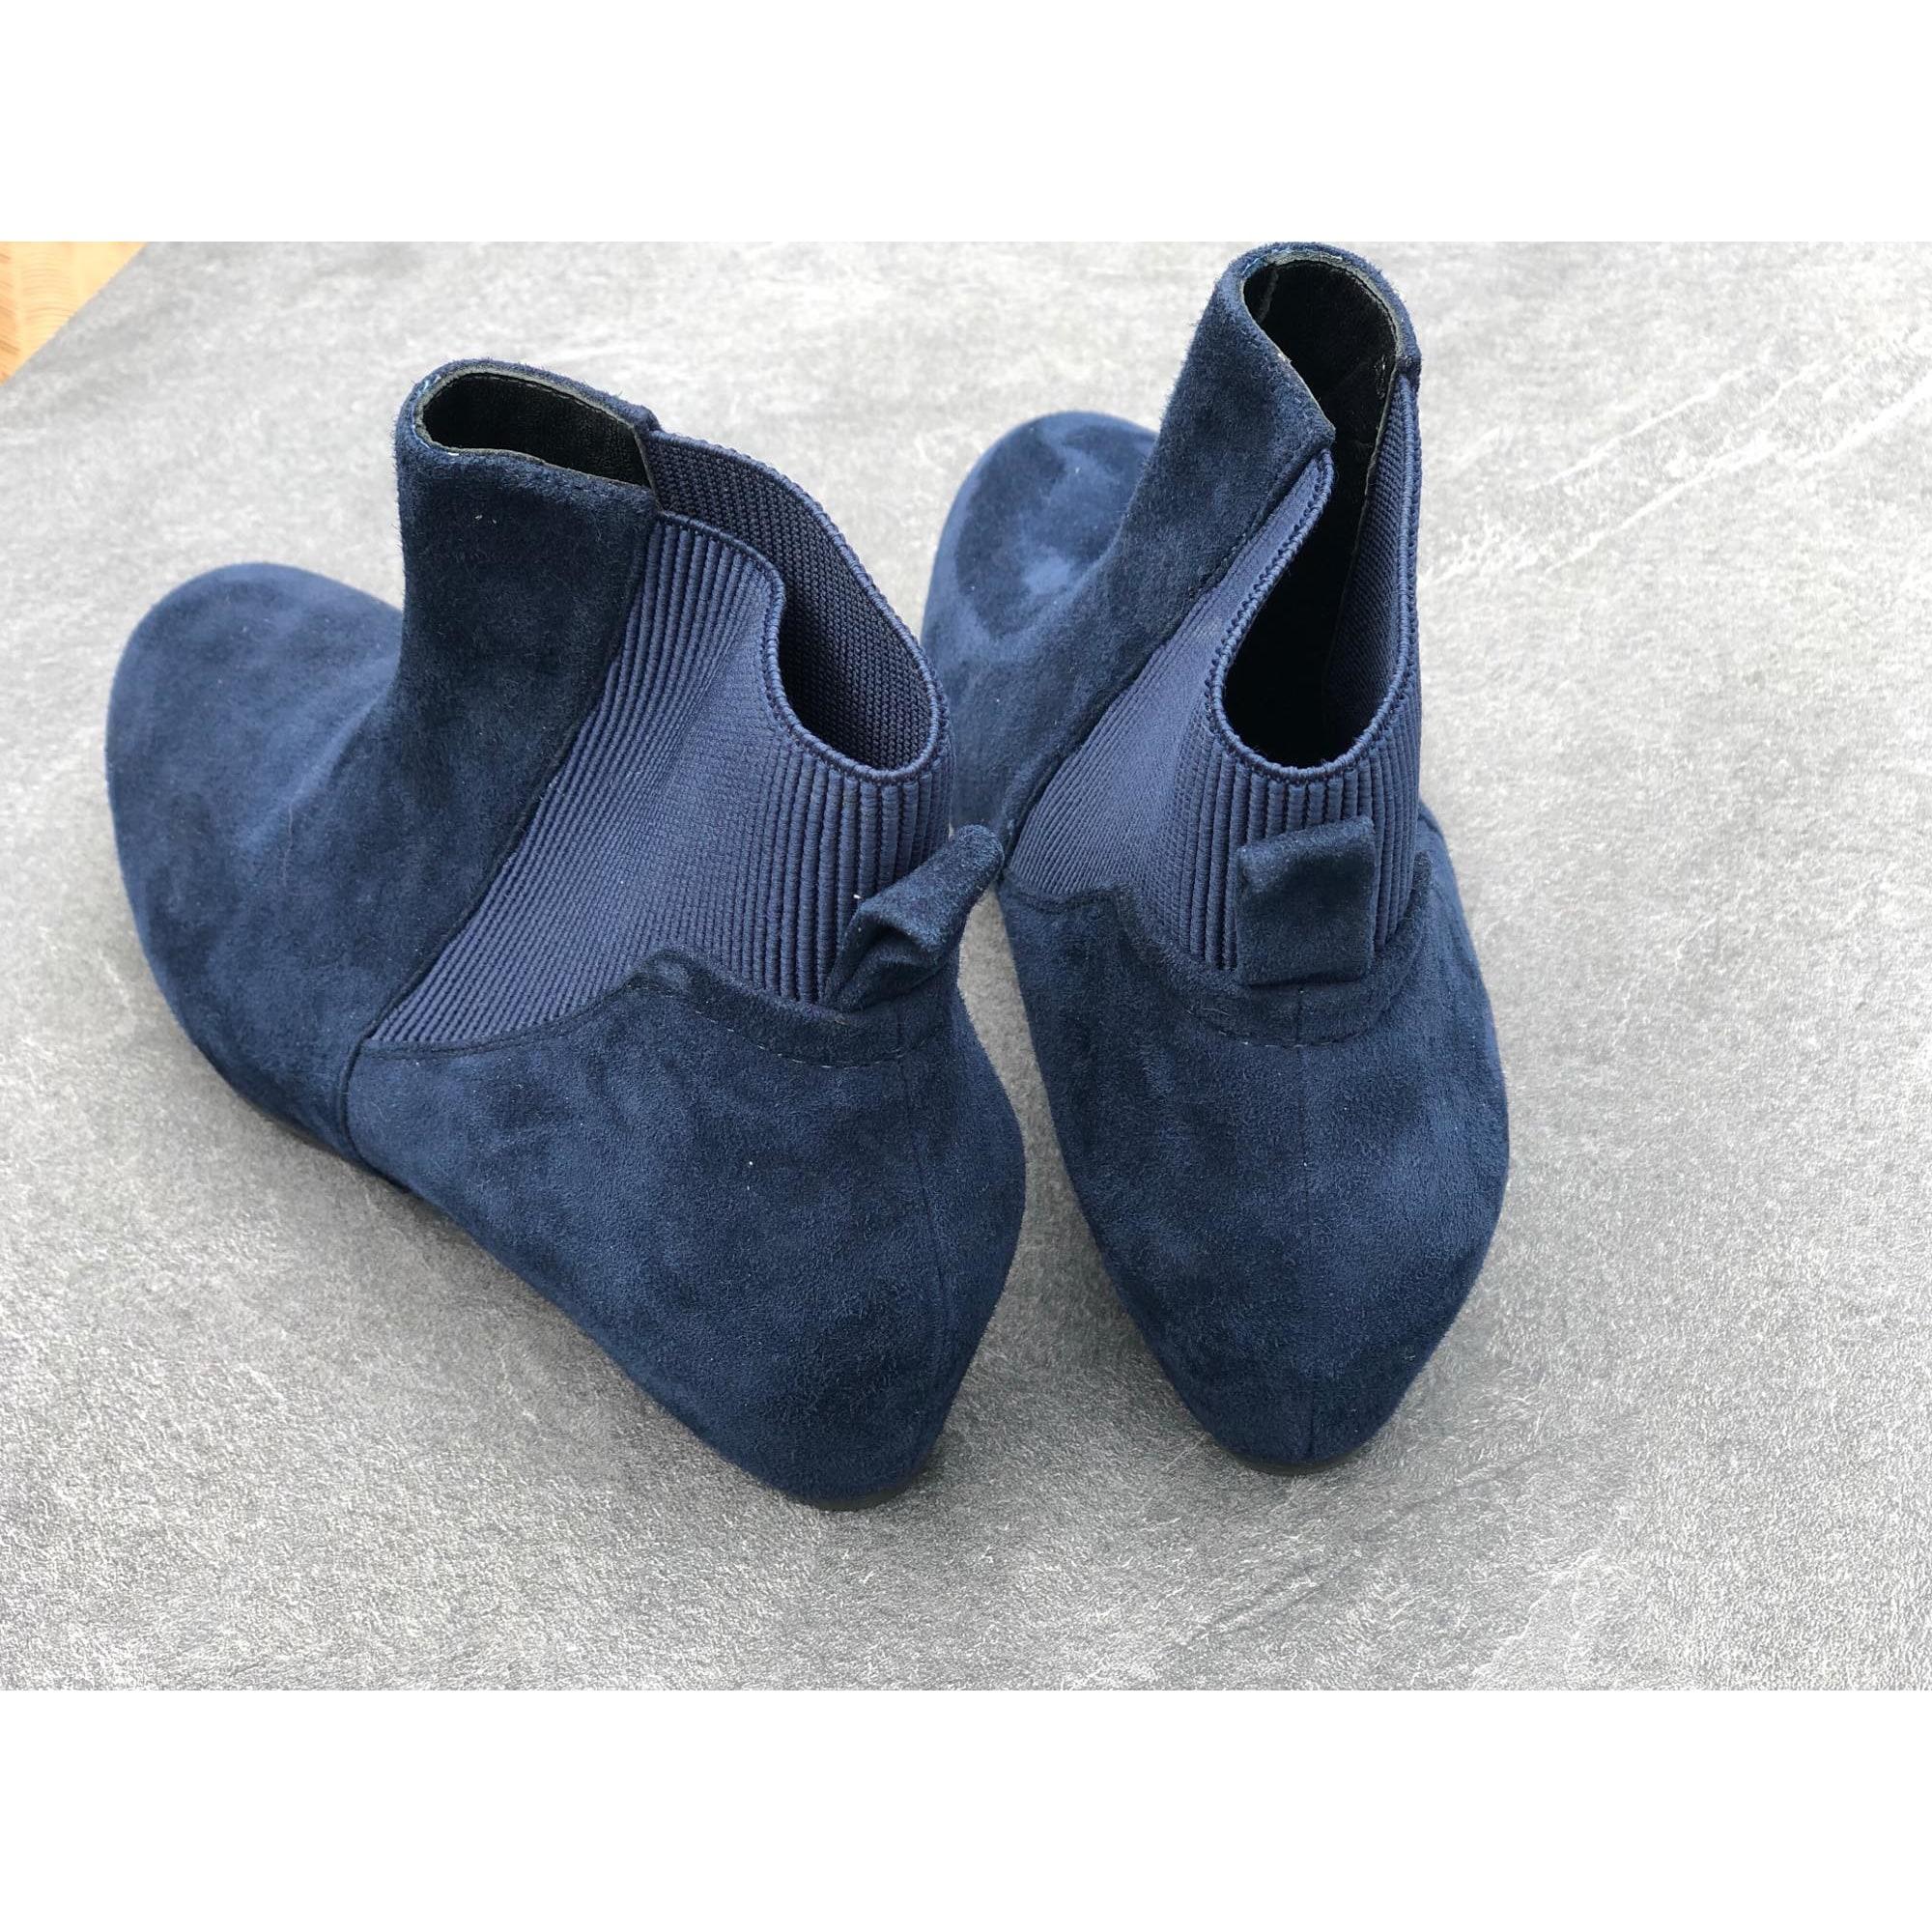 Bottines & low boots à compensés JB MARTIN Bleu, bleu marine, bleu turquoise